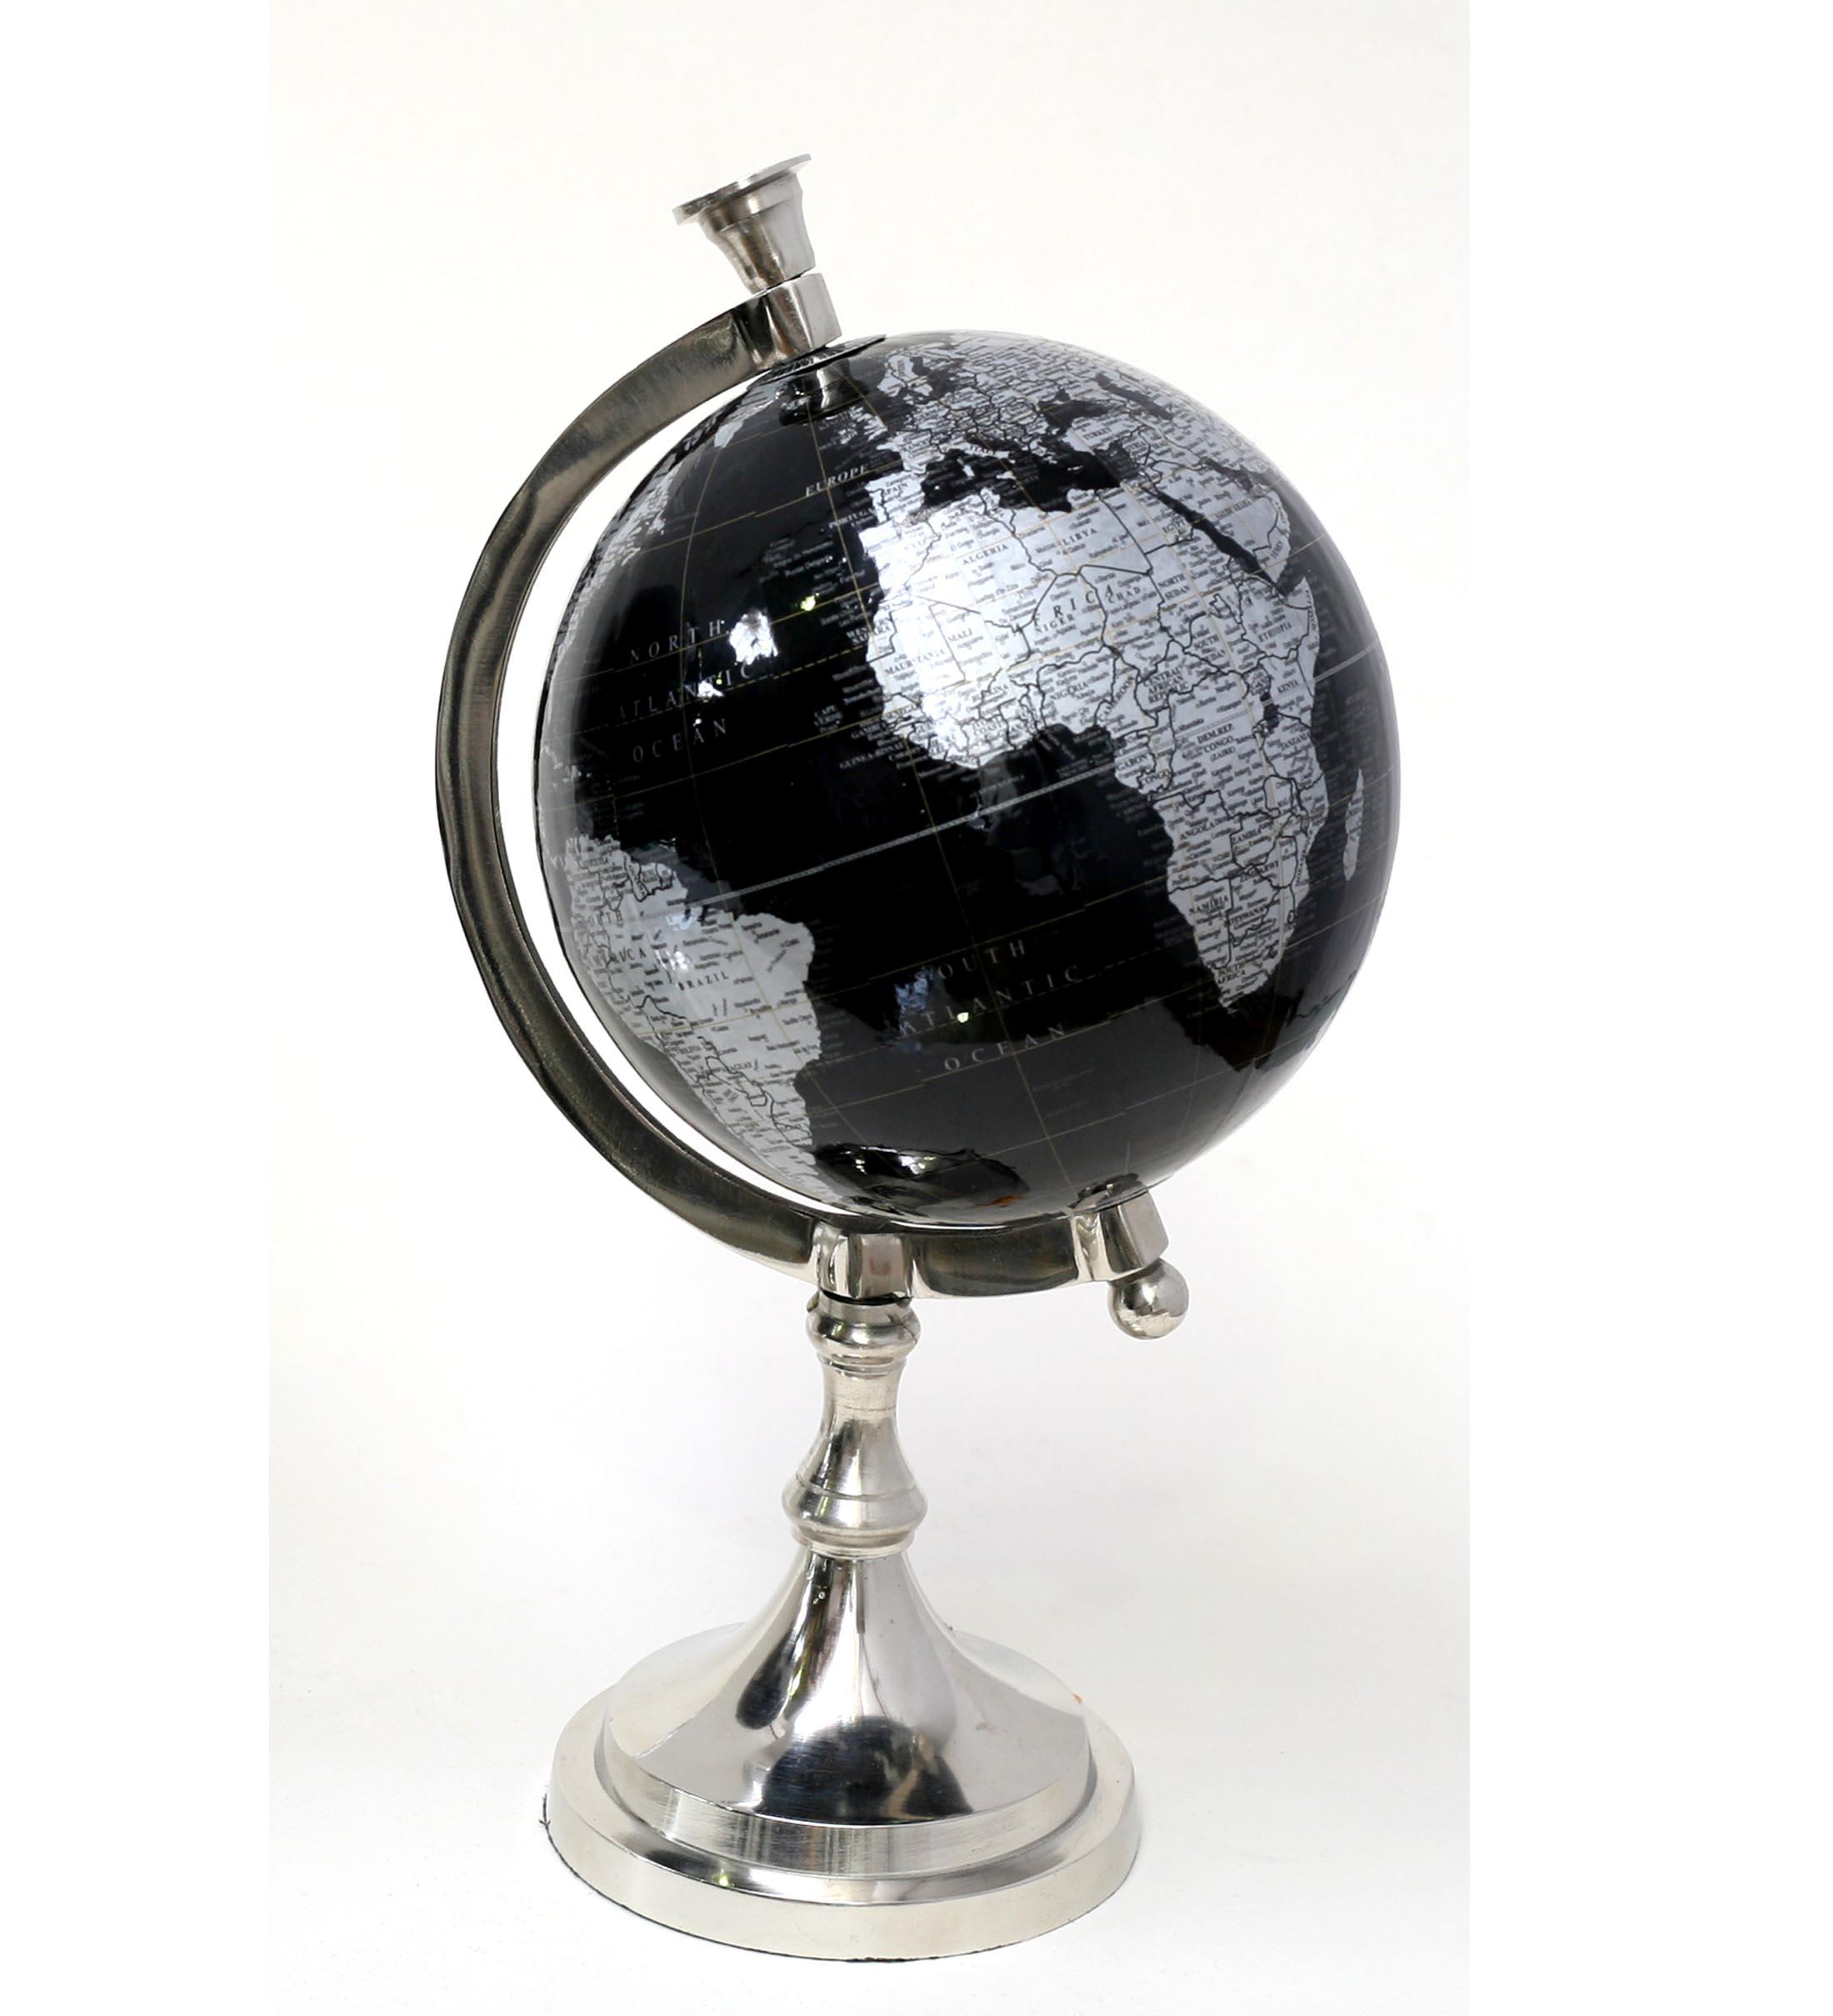 Bola del mundo plat neg 18x32x16 cms conchi decoraci n - Bola del mundo decoracion ...